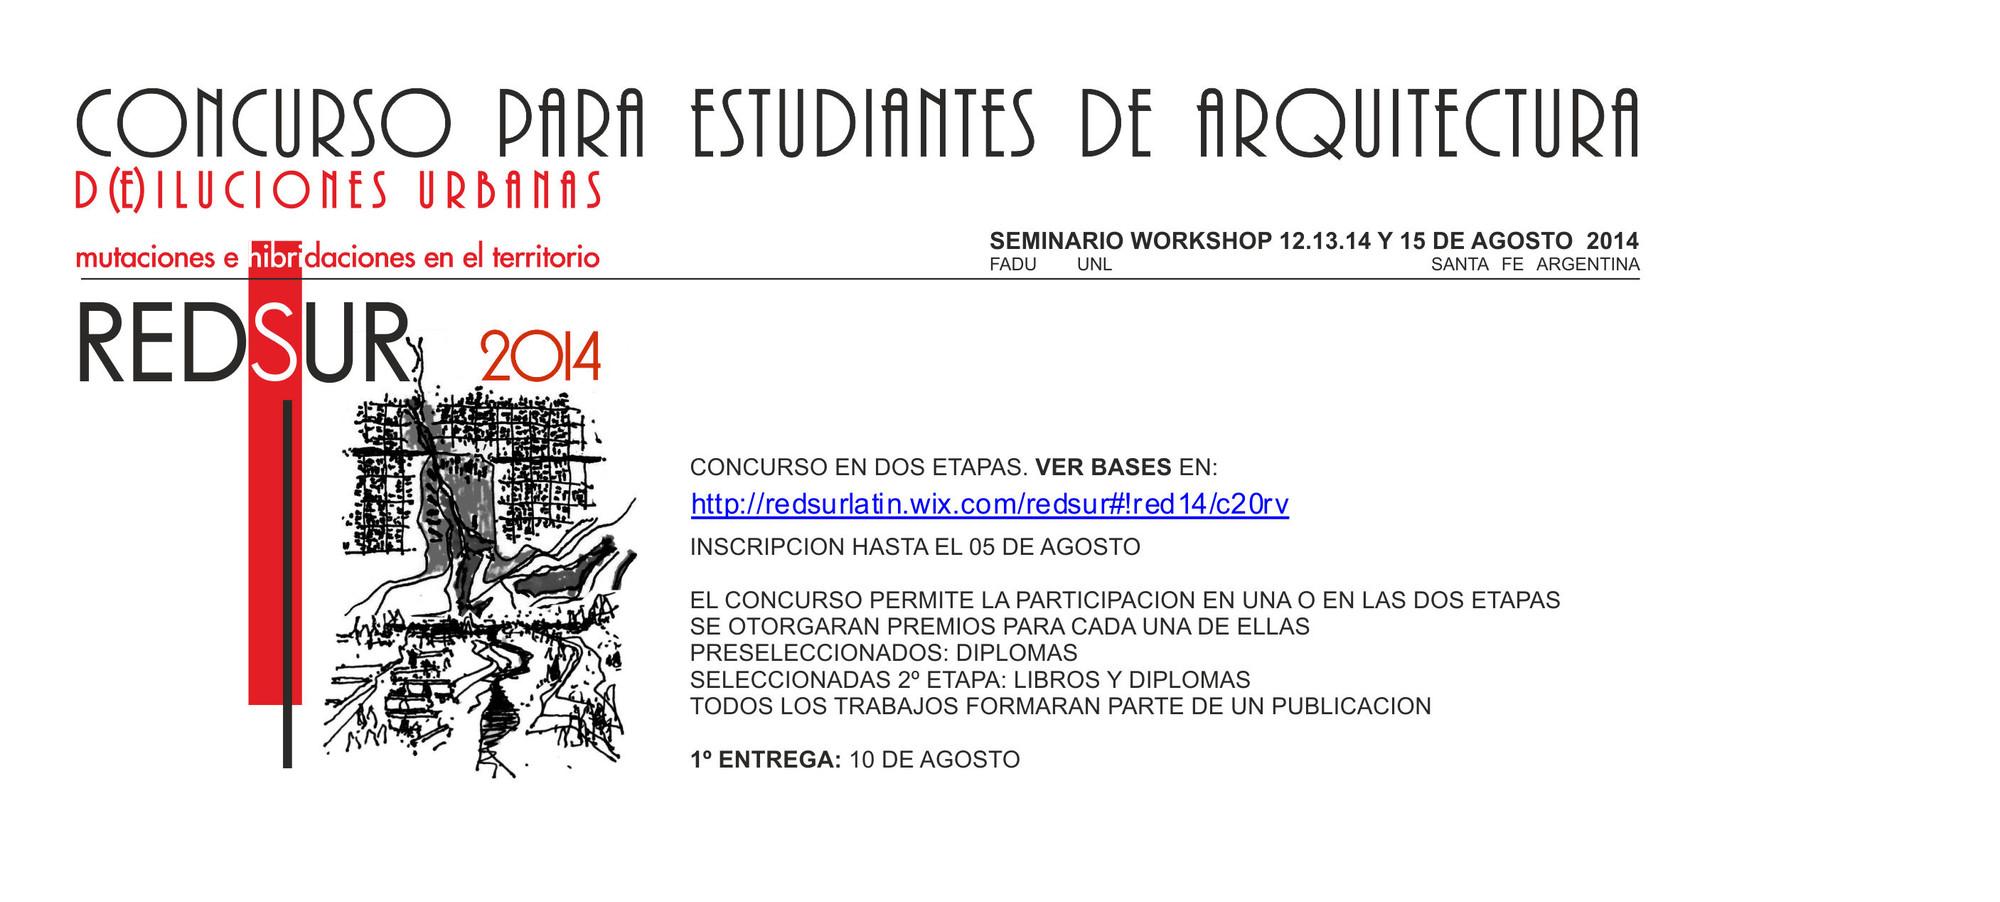 Concurso de Ideas D(e)iluciones urbanas / Santa Fe, Argentina